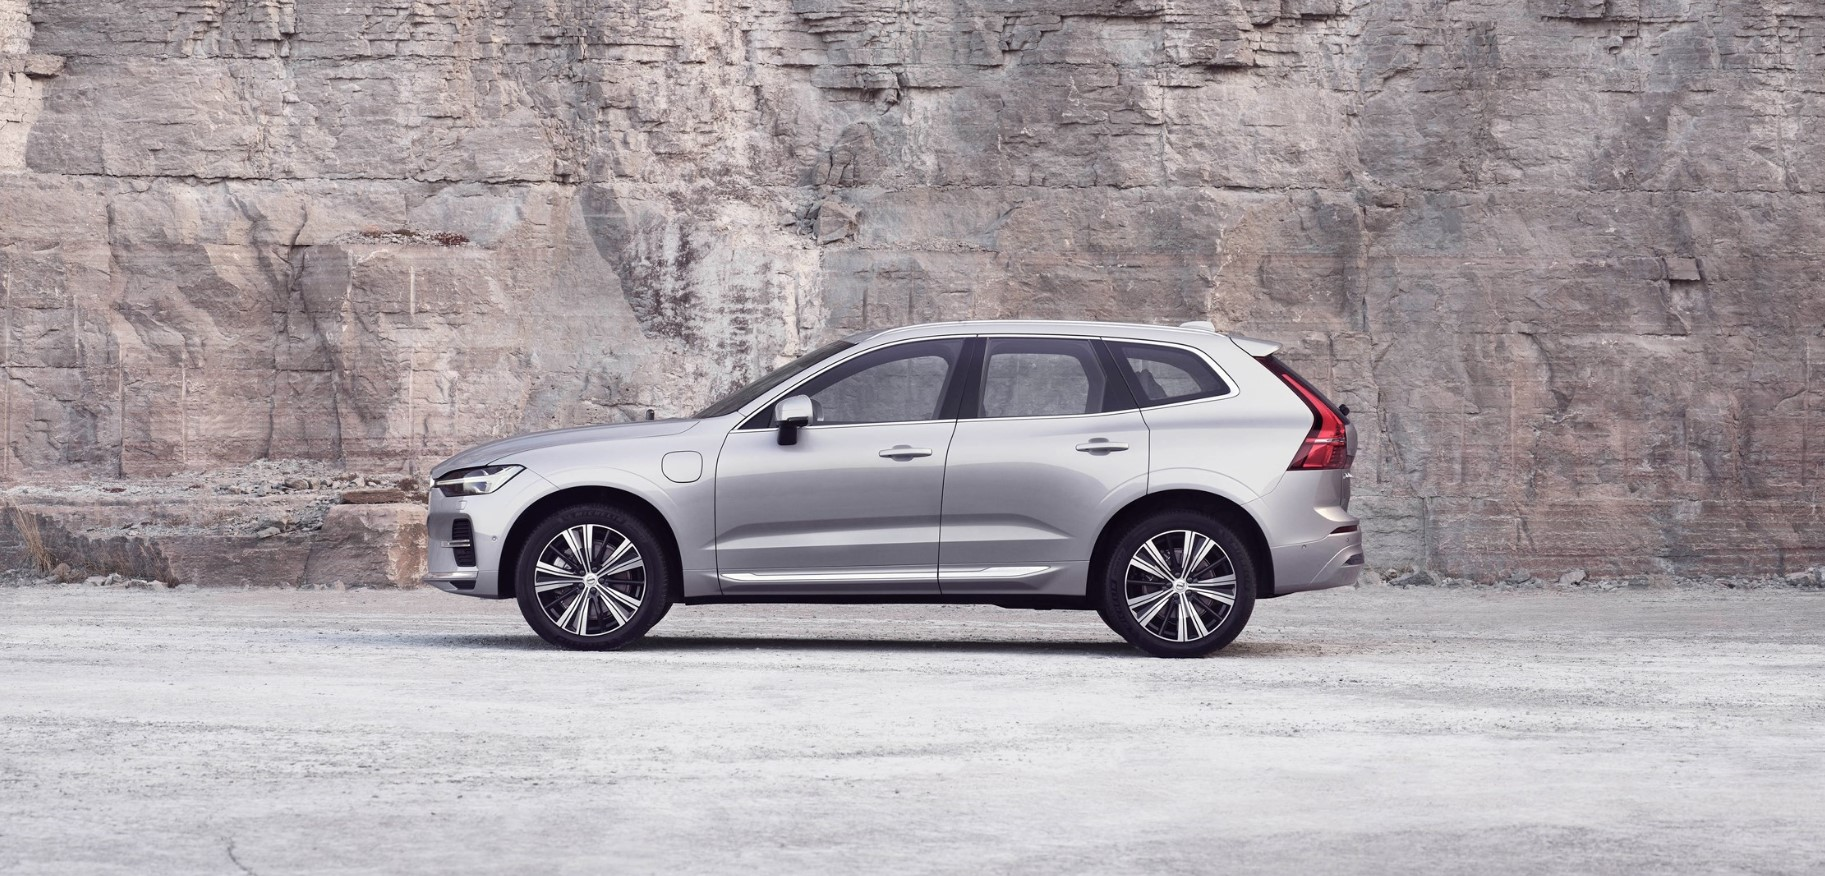 Volvo добавил систему мультимедиа на Android в кроссовер XC60